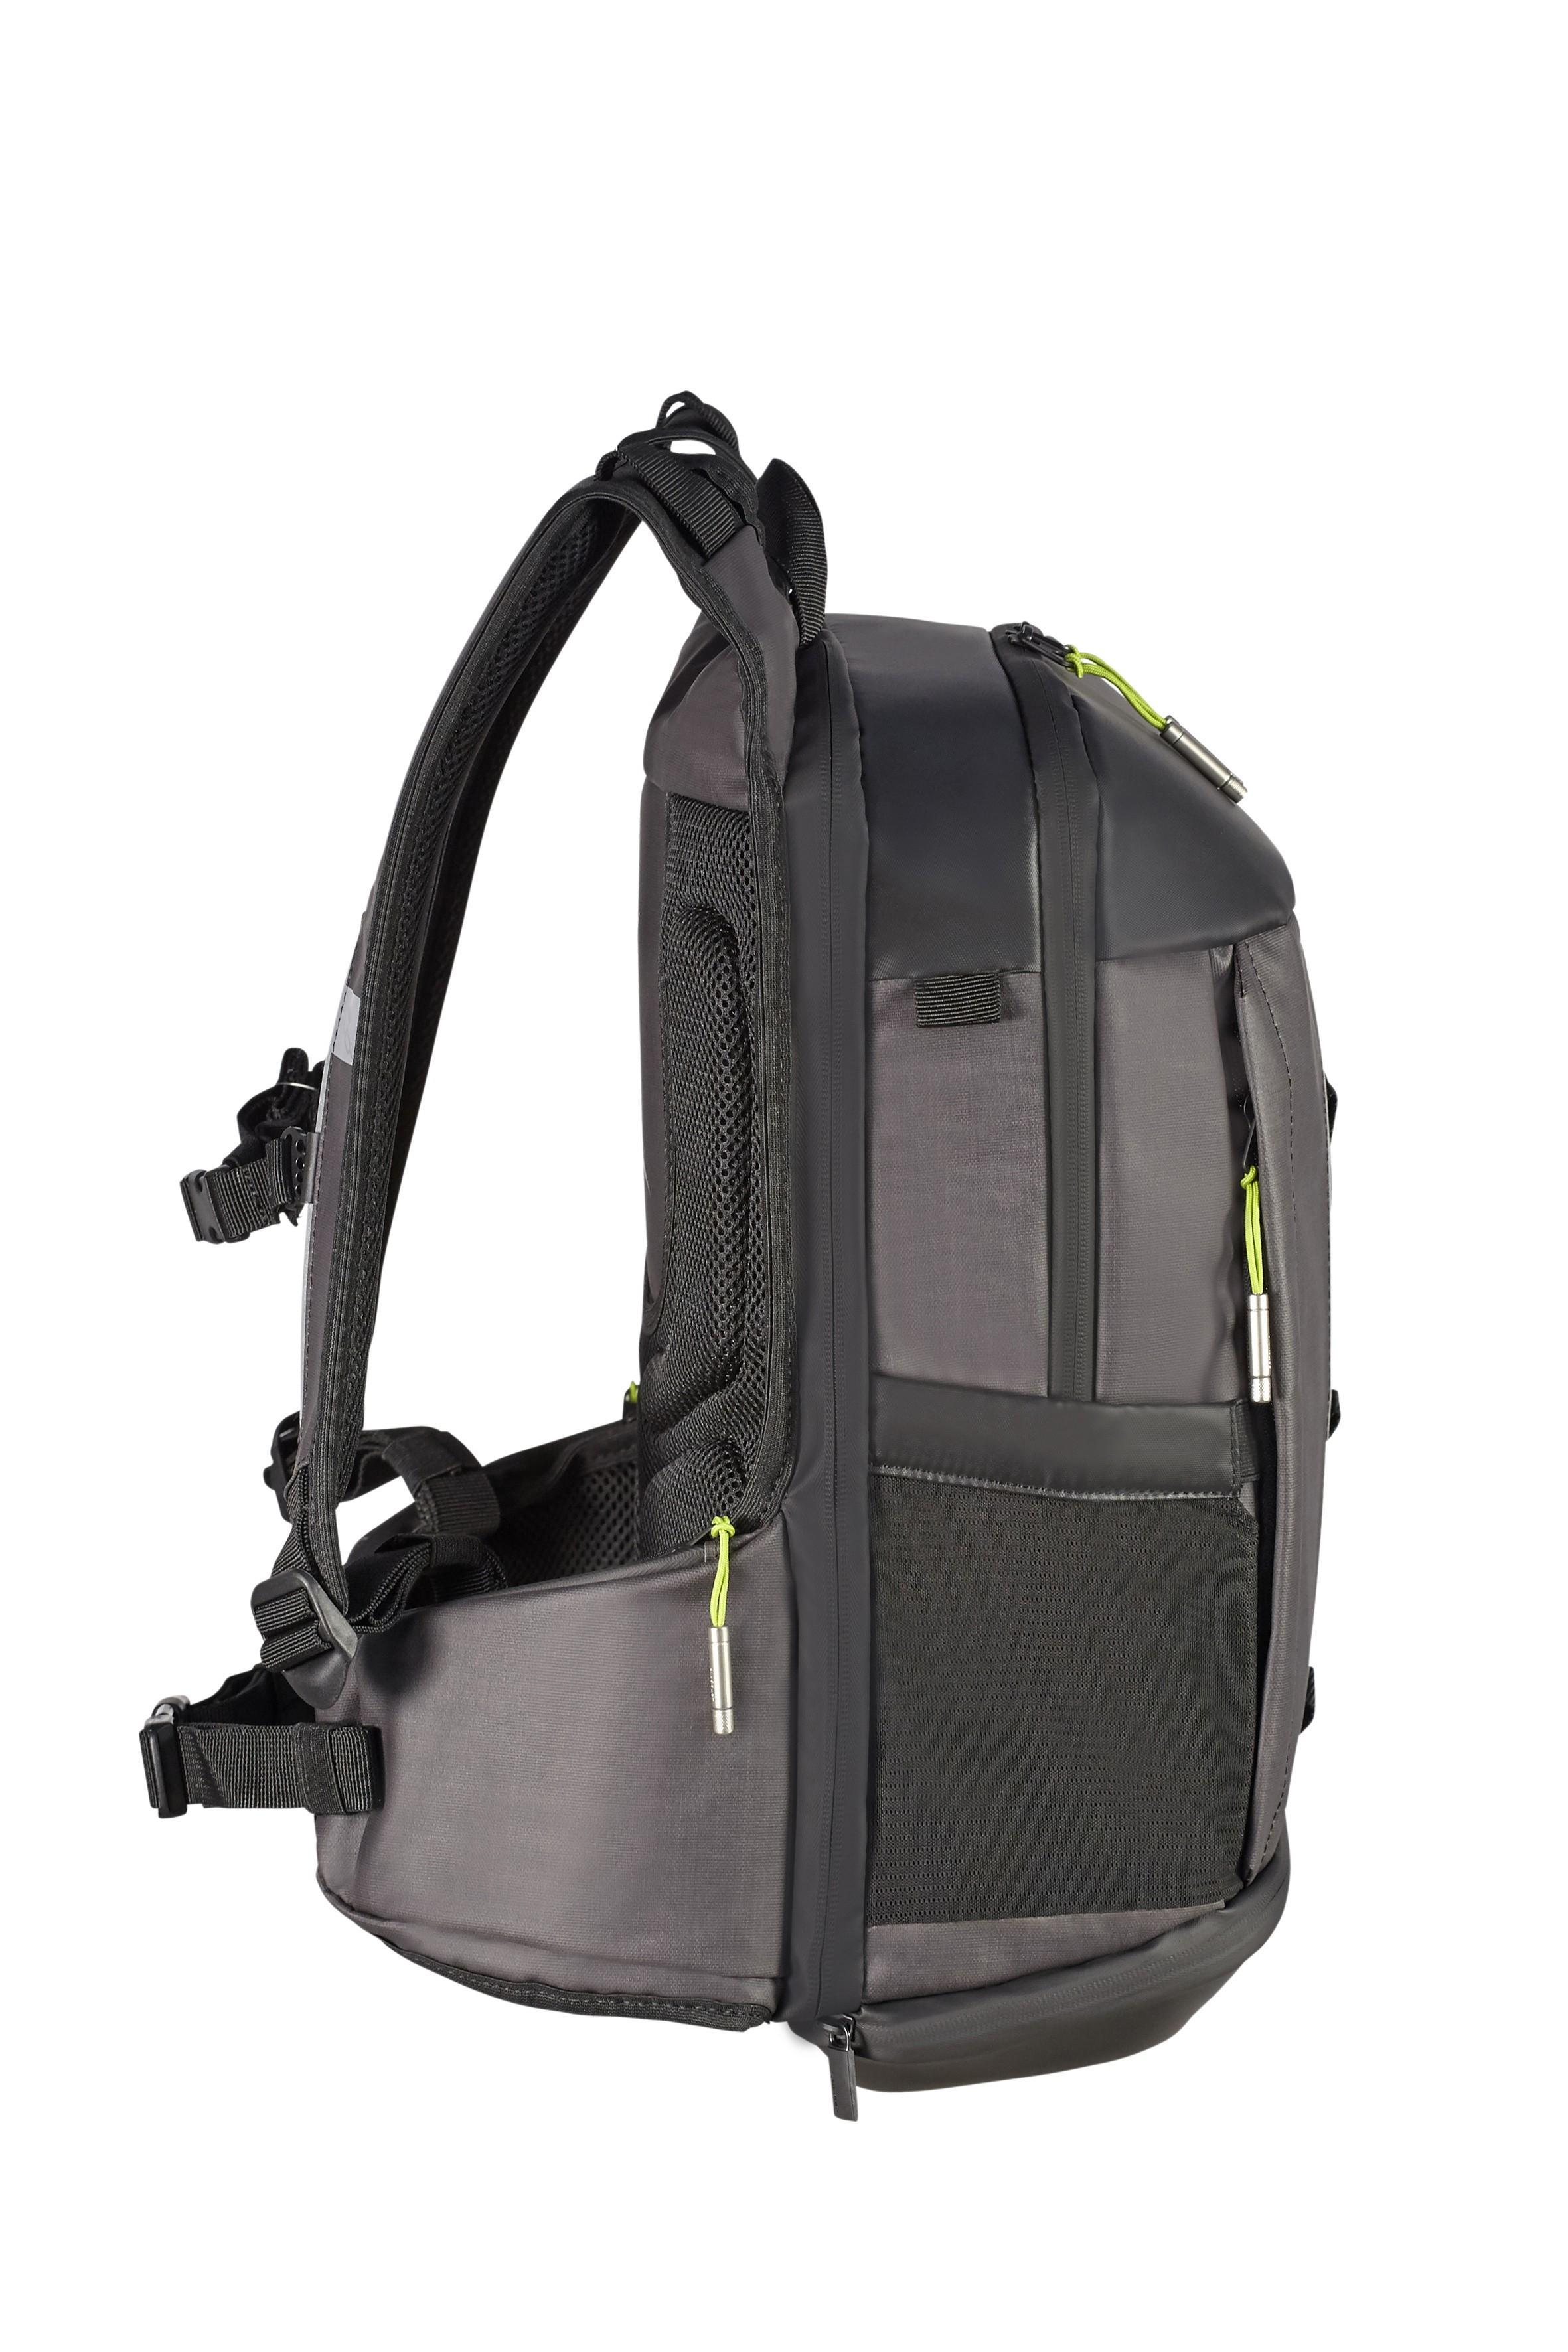 2251d057d0c2 Samsonite 2WM Laptop Backpack 15.6'' black - Taska lederwaren webshop